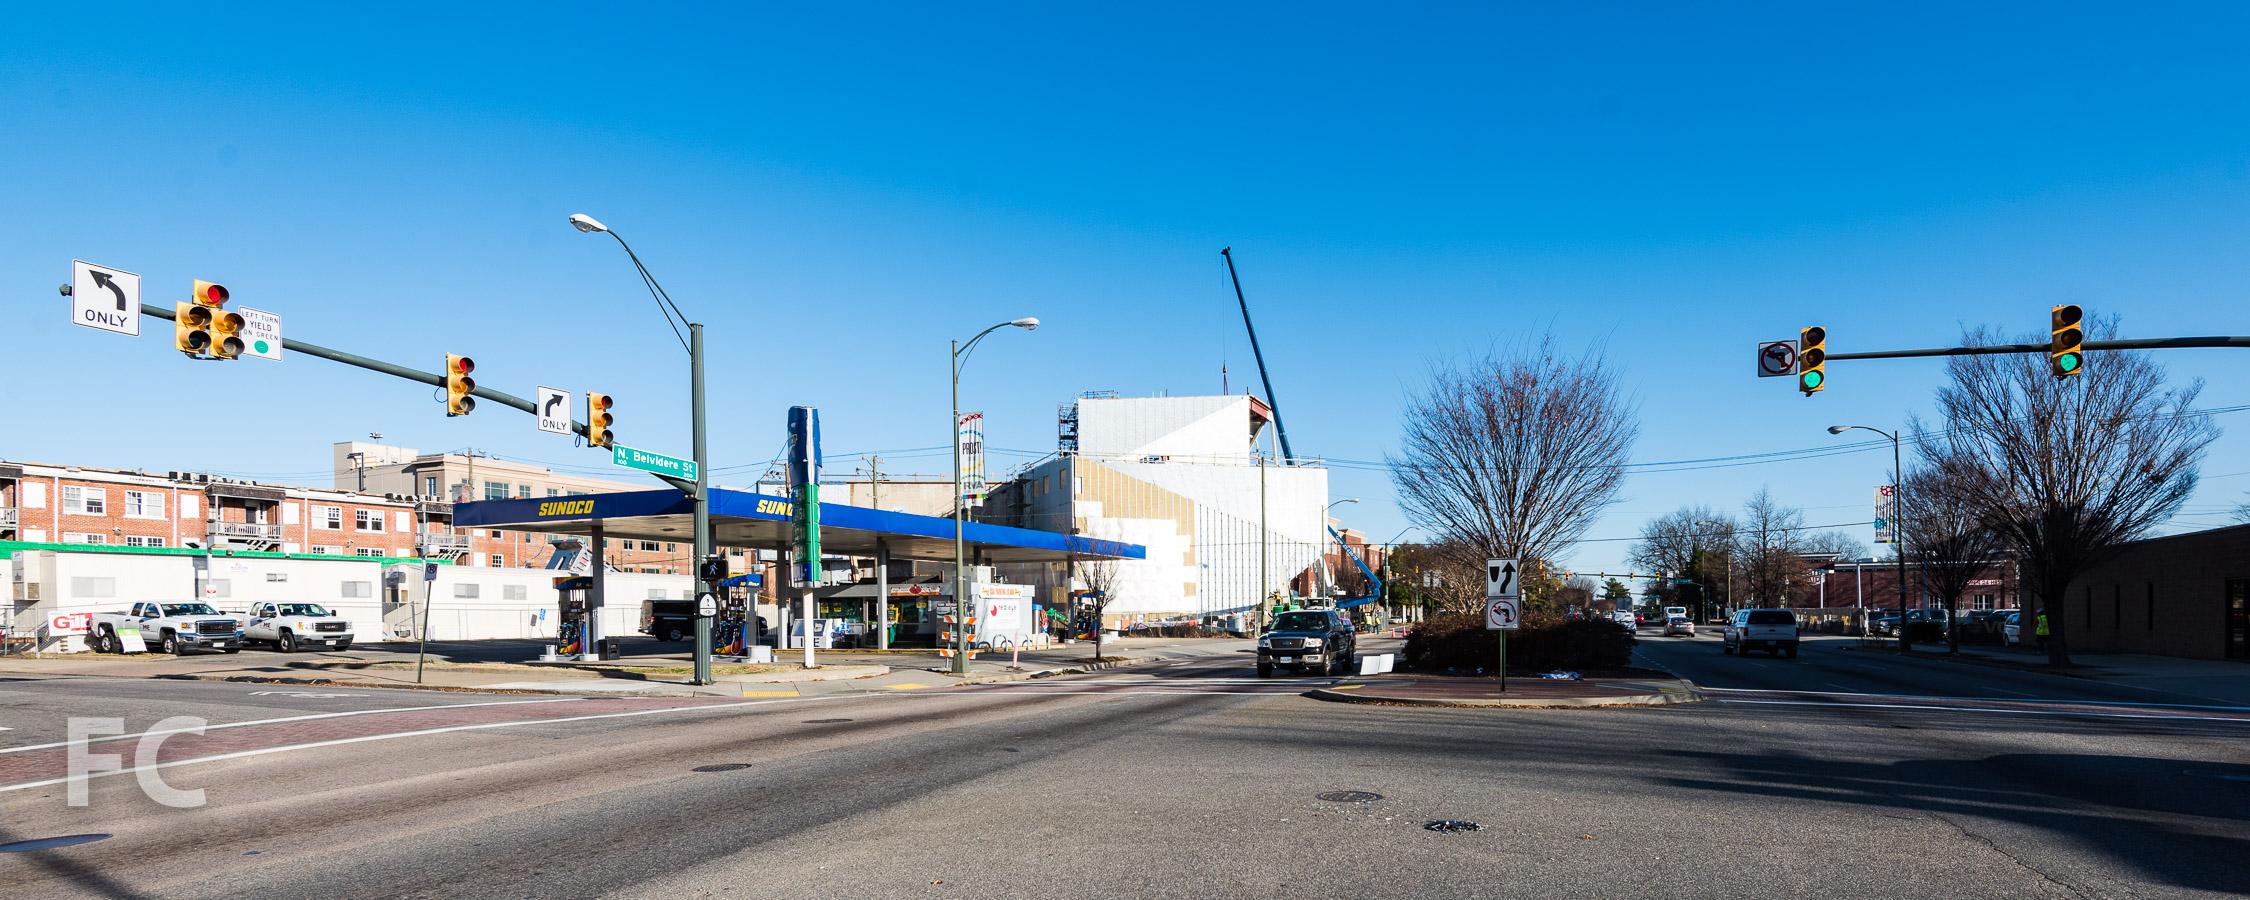 Southwest corner from North Belvidere Street.